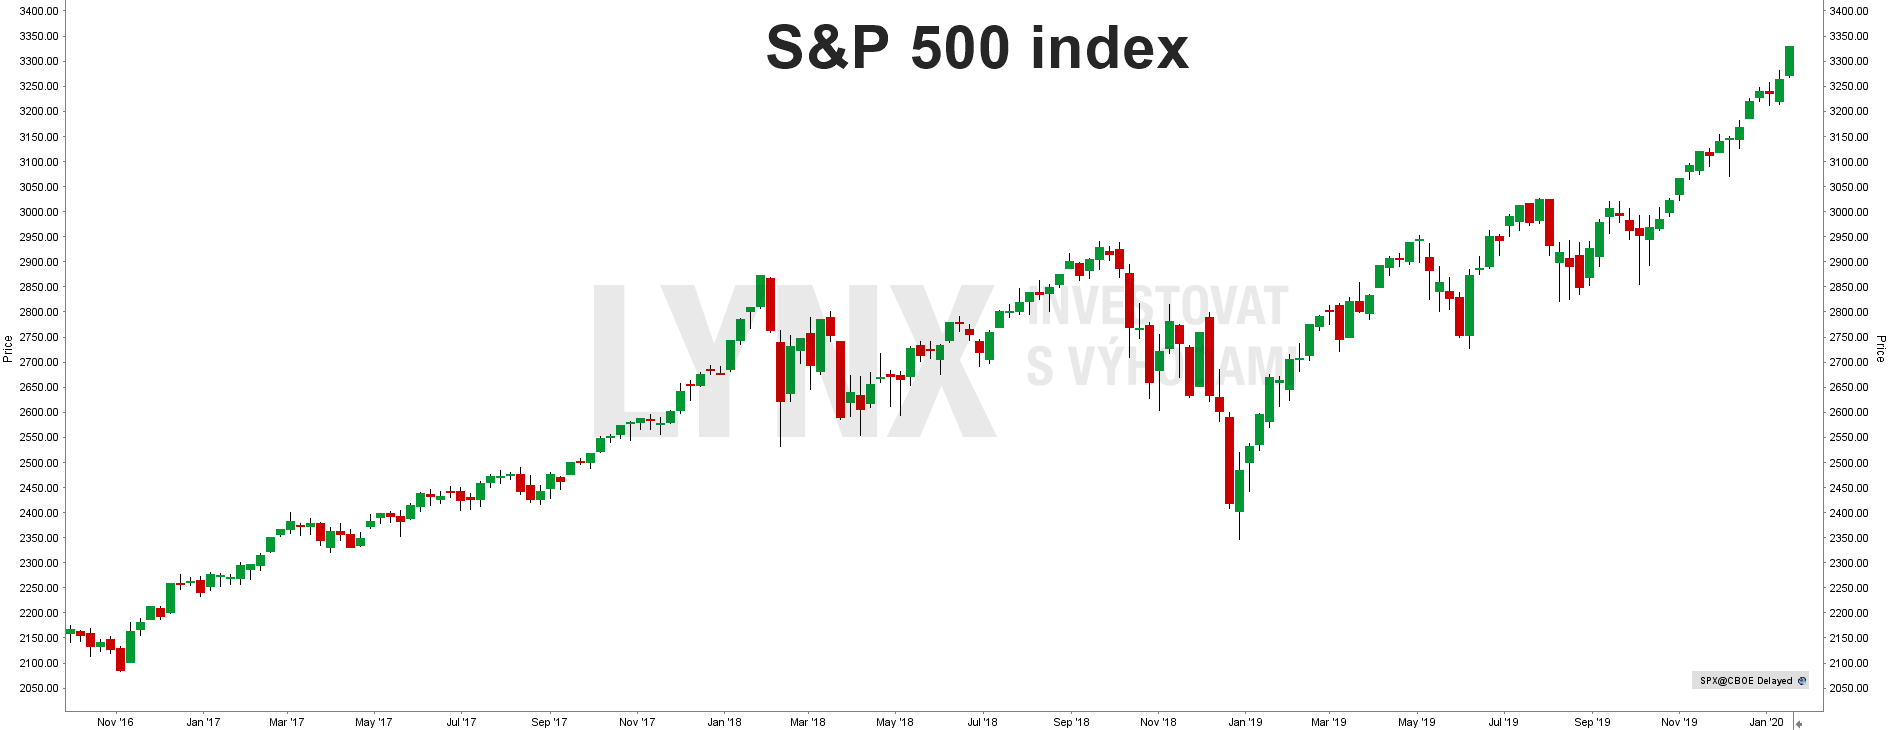 S&P 500 historicky graf